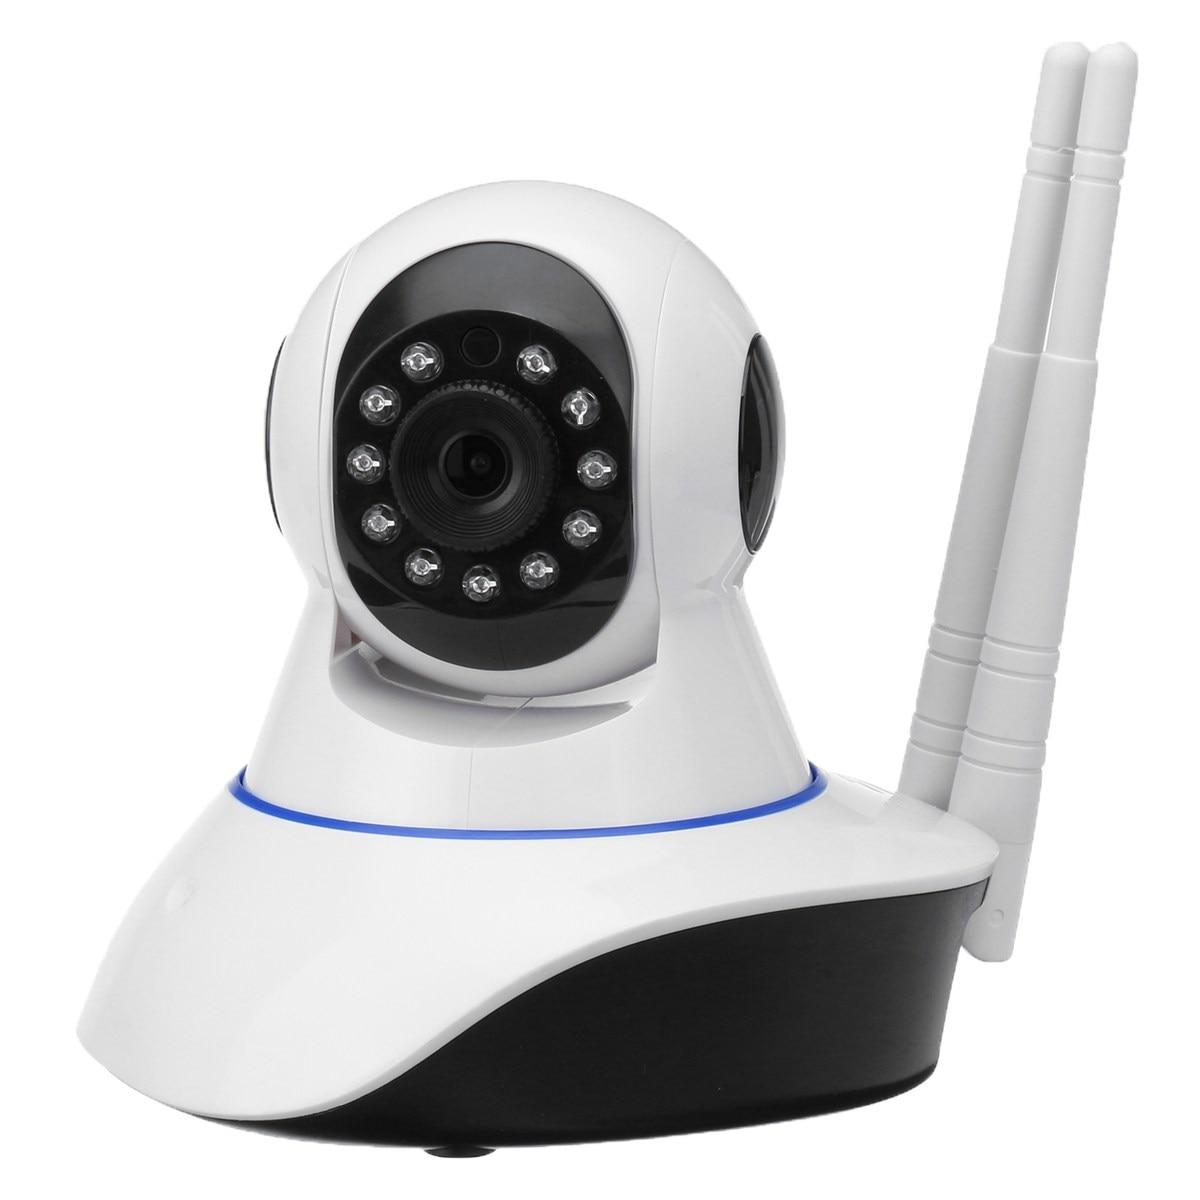 Safurance 720P HD Wireless WiFi IP Home Security Network Camera Baby Monitor CCTV IR Night Vision Safety Surveillance safurance mini wireless network wifi ip camera security nanny night vision cam surveillance home security